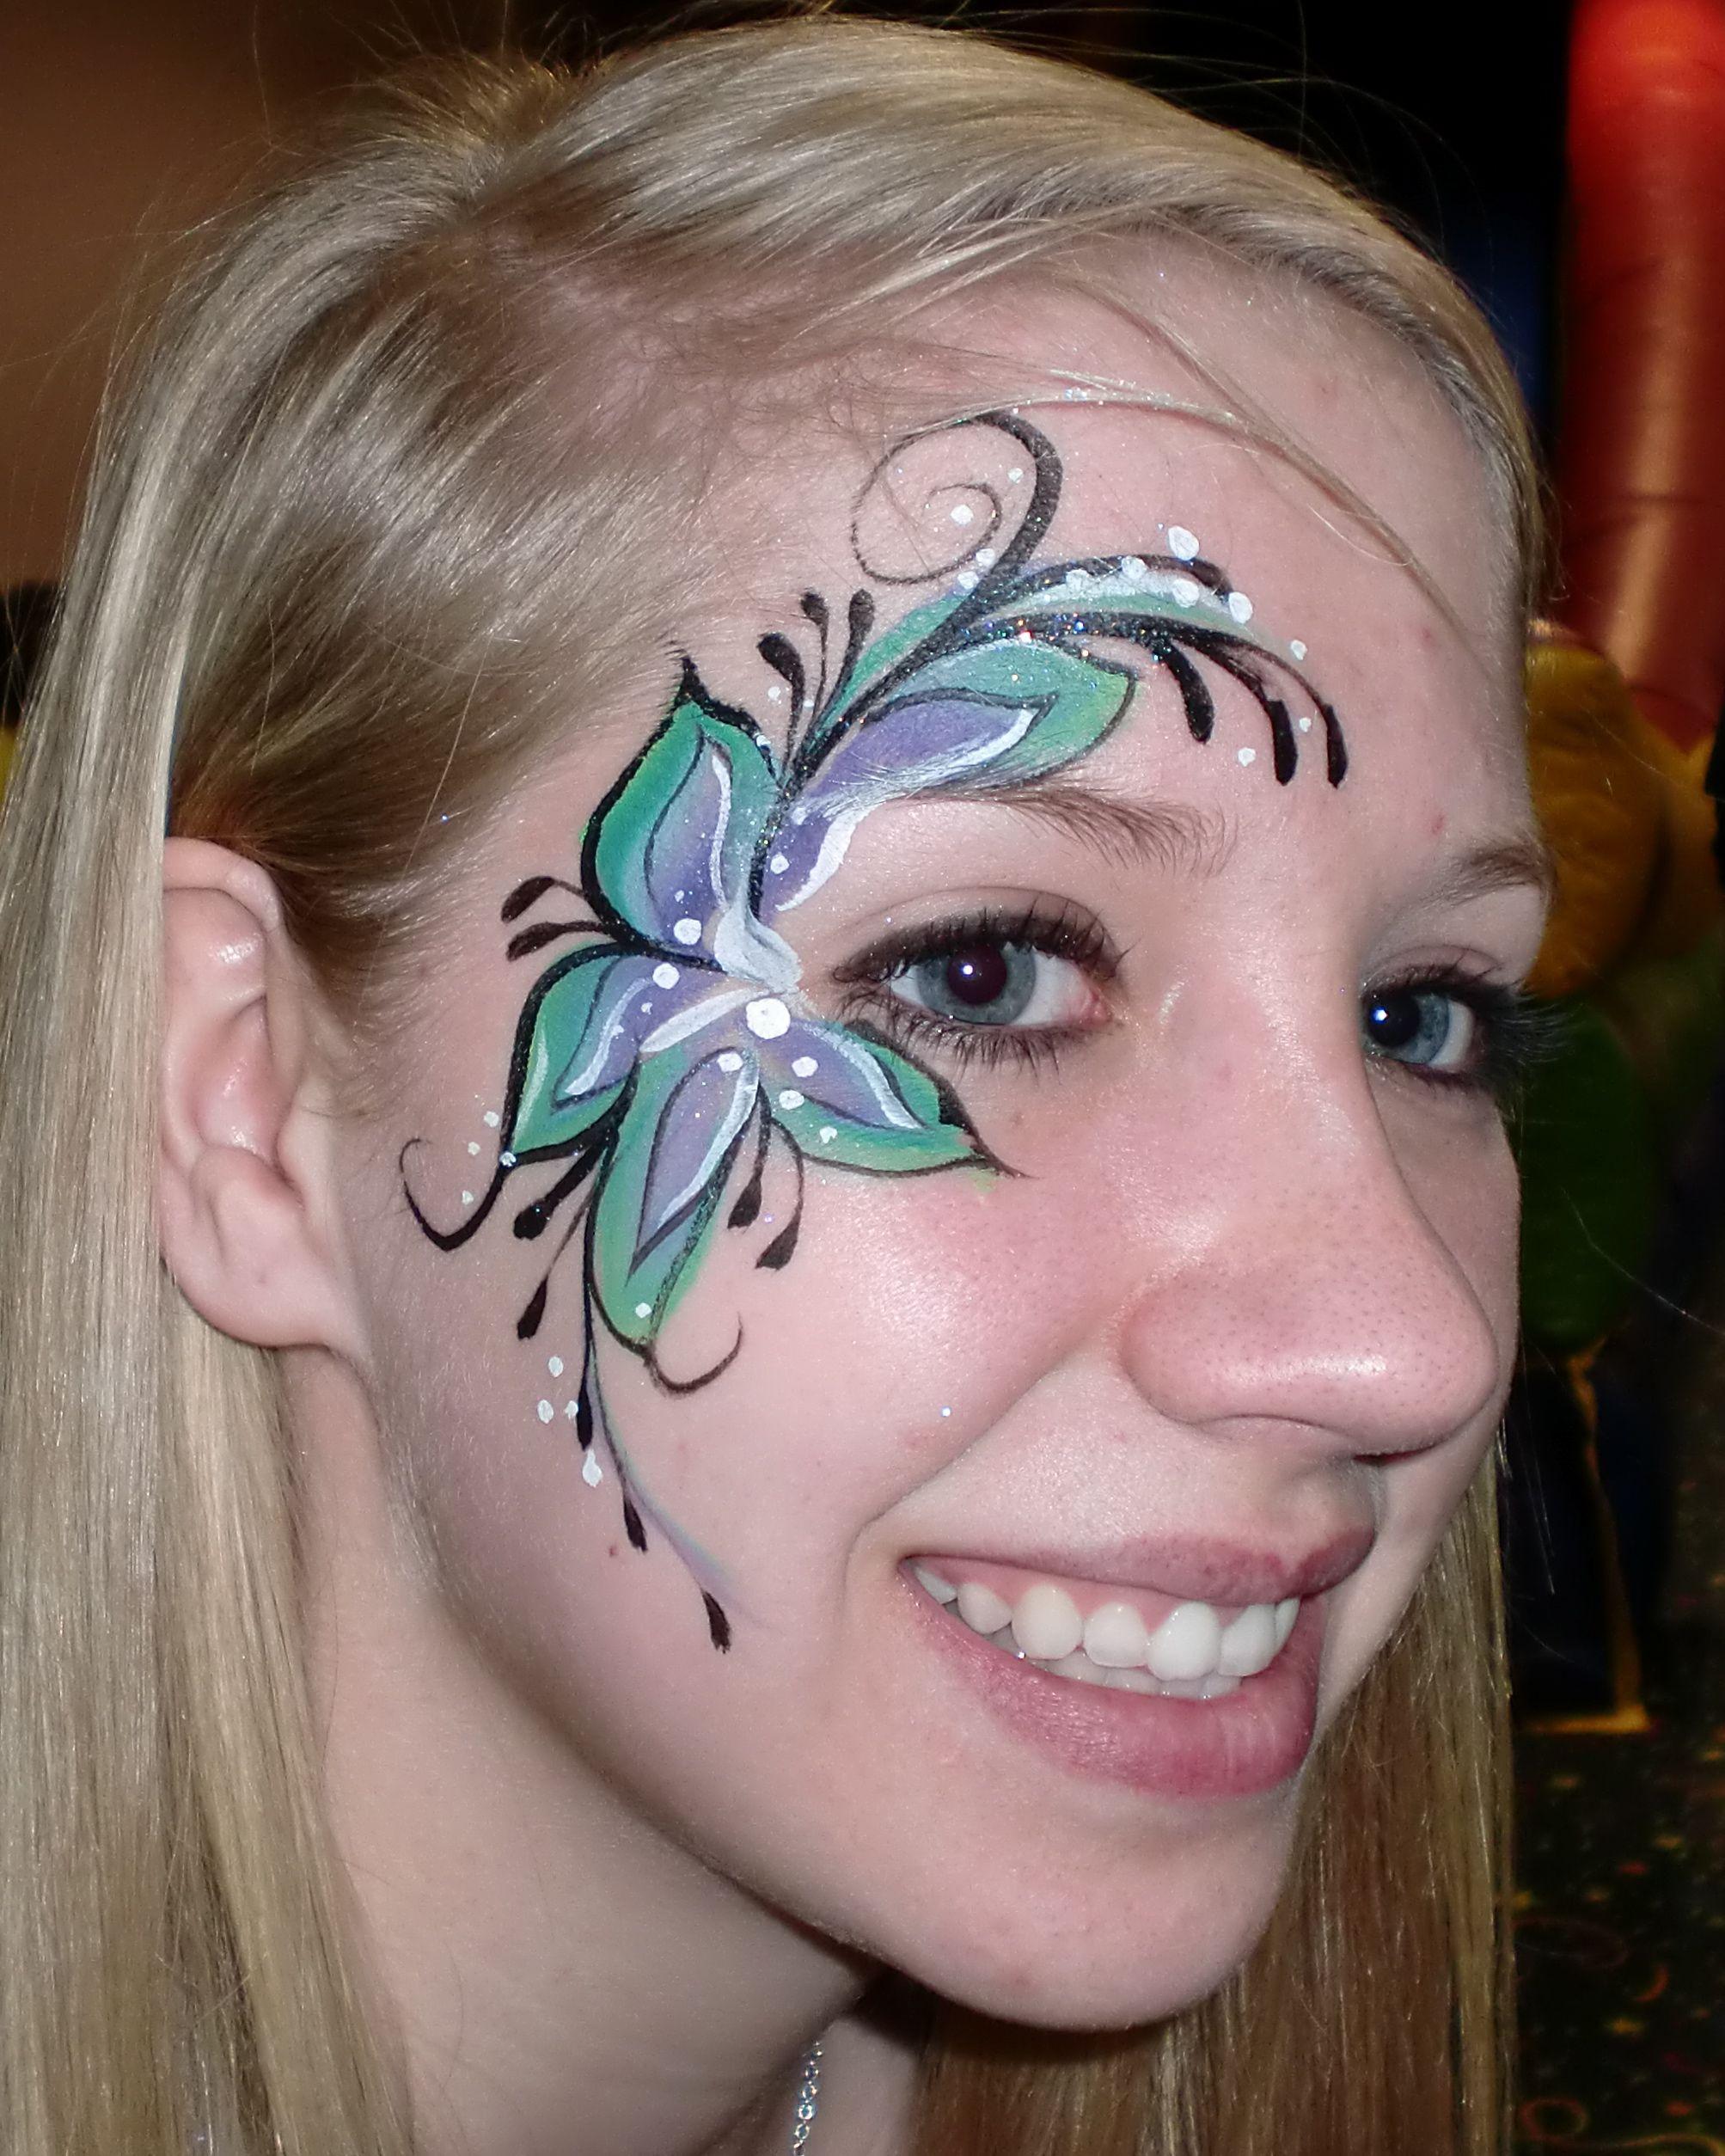 Facepainting Flower Eyedesign 801 554 2364 Princess Party Www Facepaintingillusions Blogspot Com Face Painting Flowers Face Painting Face Painting Easy